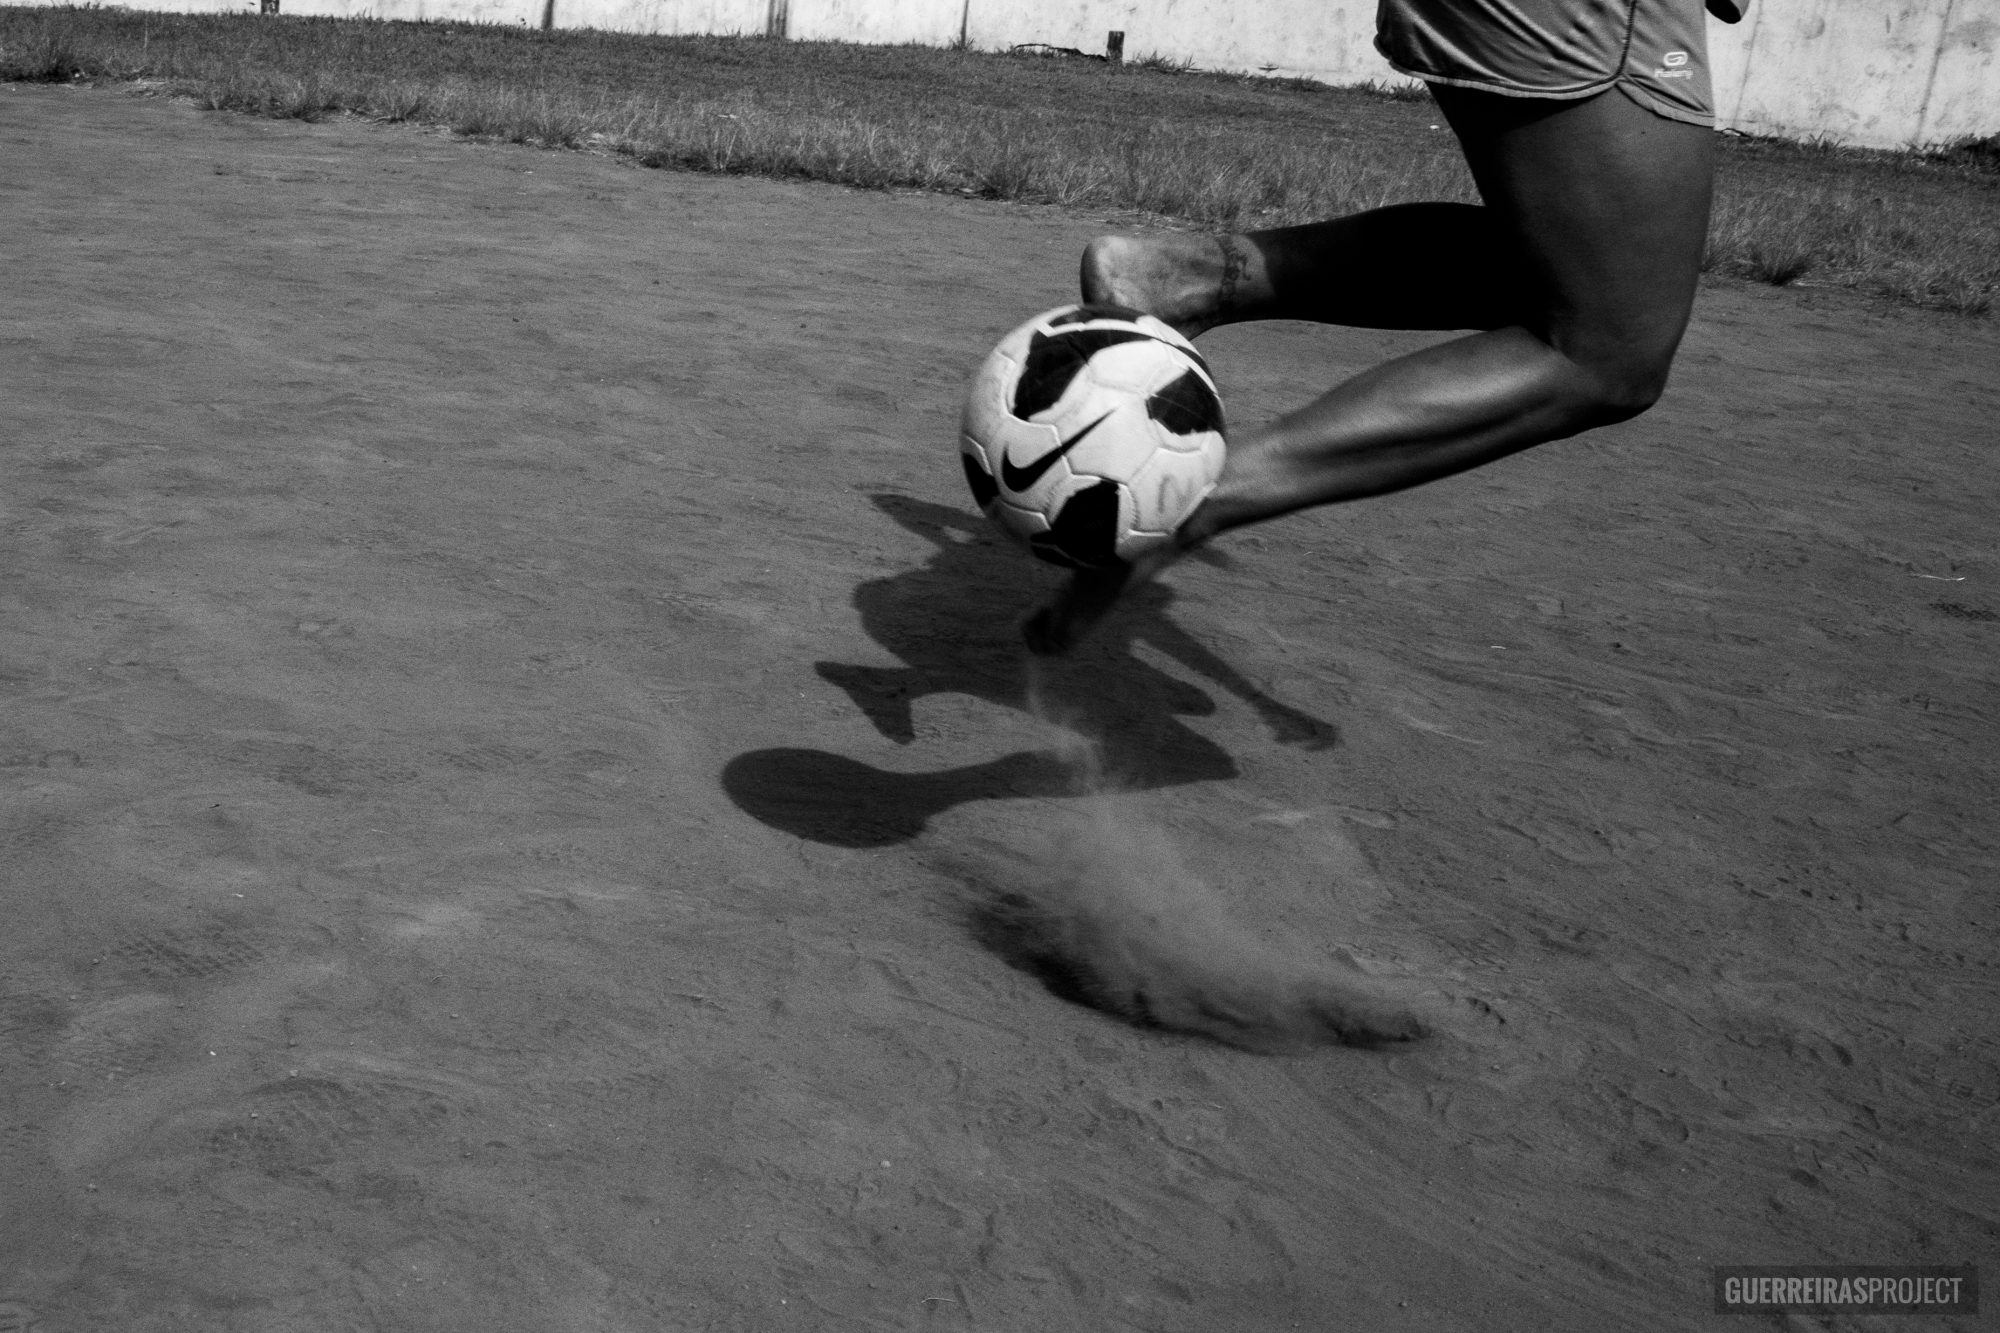 Projeto Guerreiras, 2014. Foto de Daniel Kfouri.